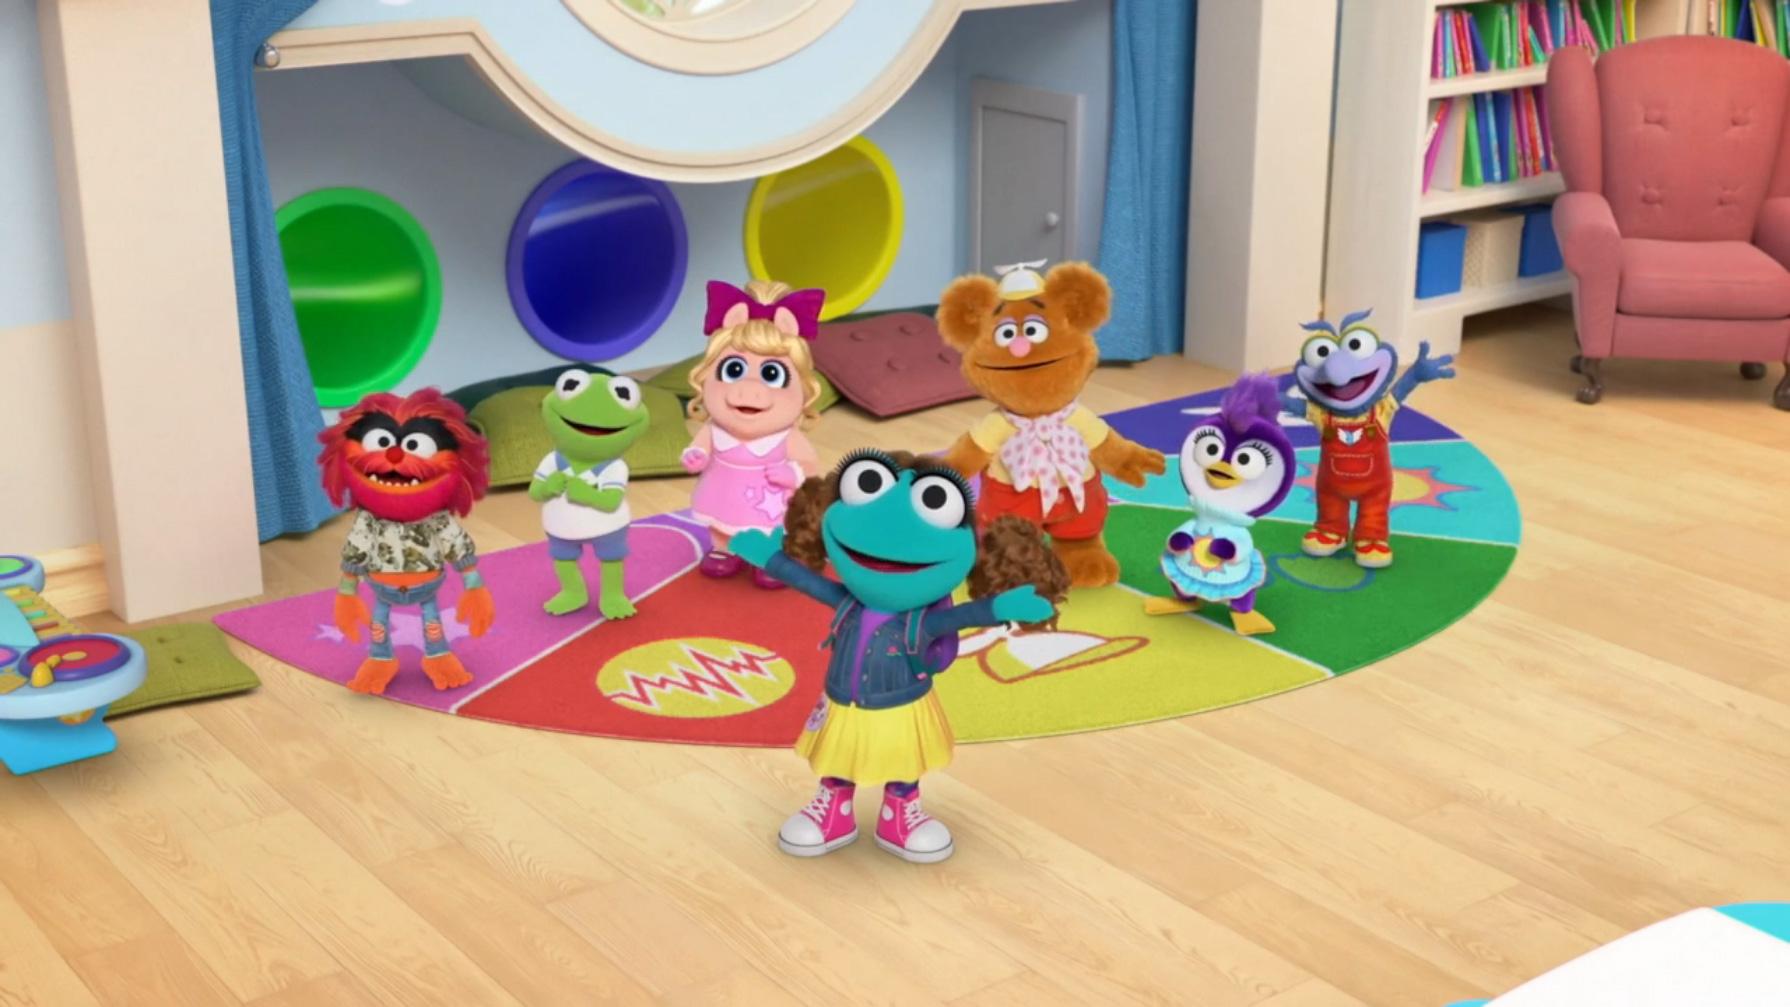 Muppet Babies 2021 A Very Muppet Babies Christmas Episode 313 A Very Sticker Situation Boo Boo Bamboozle Muppet Wiki Fandom